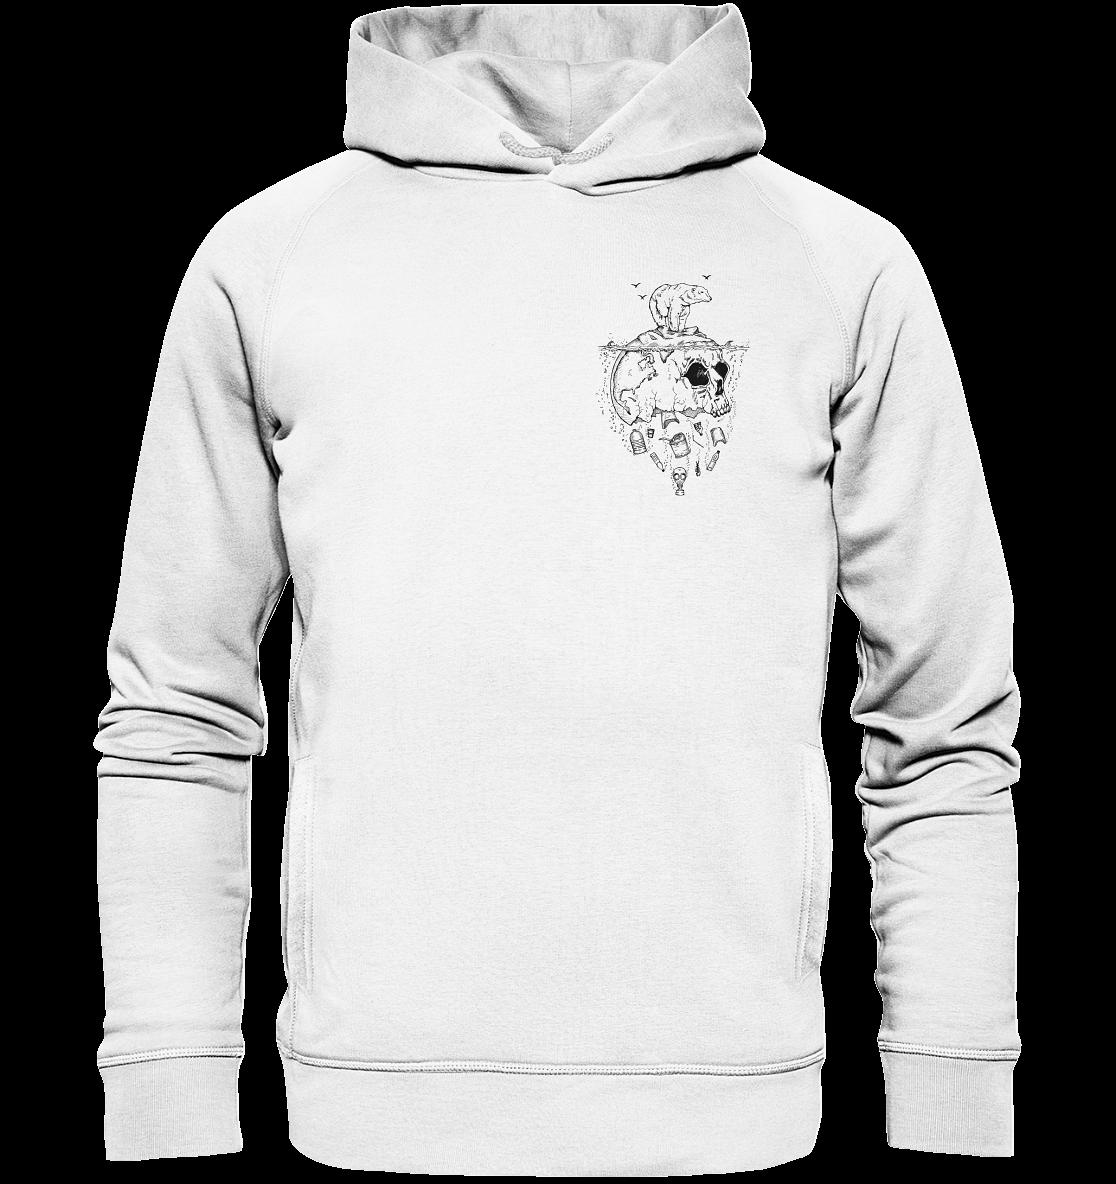 front-organic-fashion-hoodie-f8f8f8-1116x-19.png